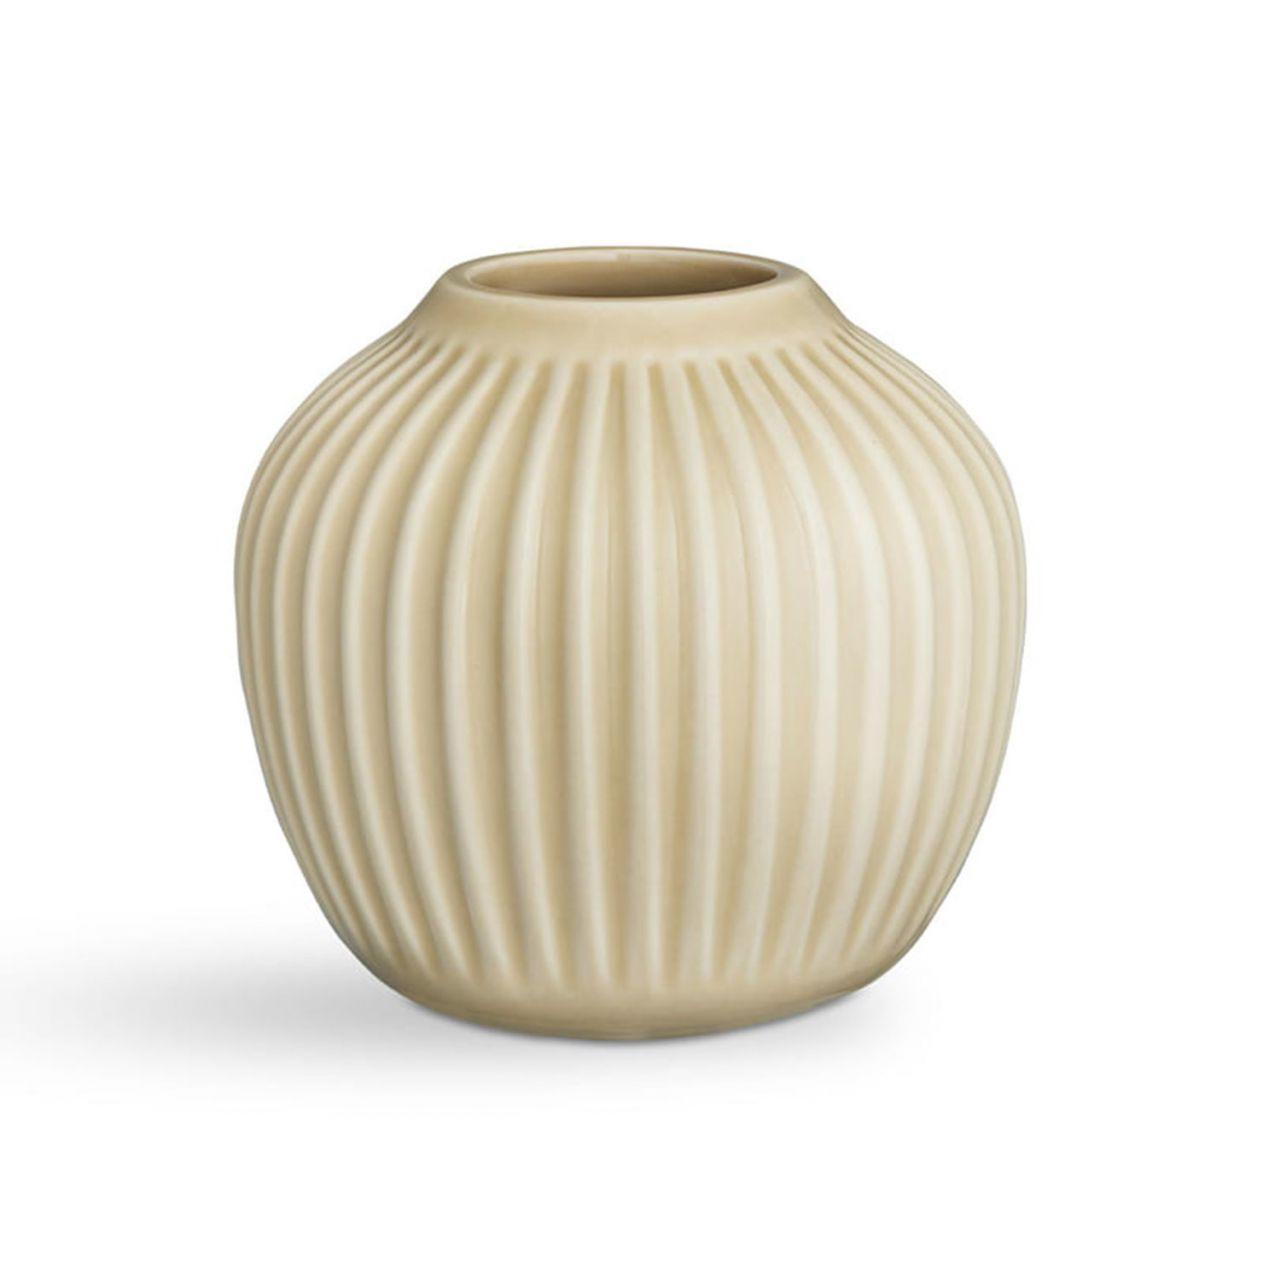 Kähler - Hammershoi Vase H125